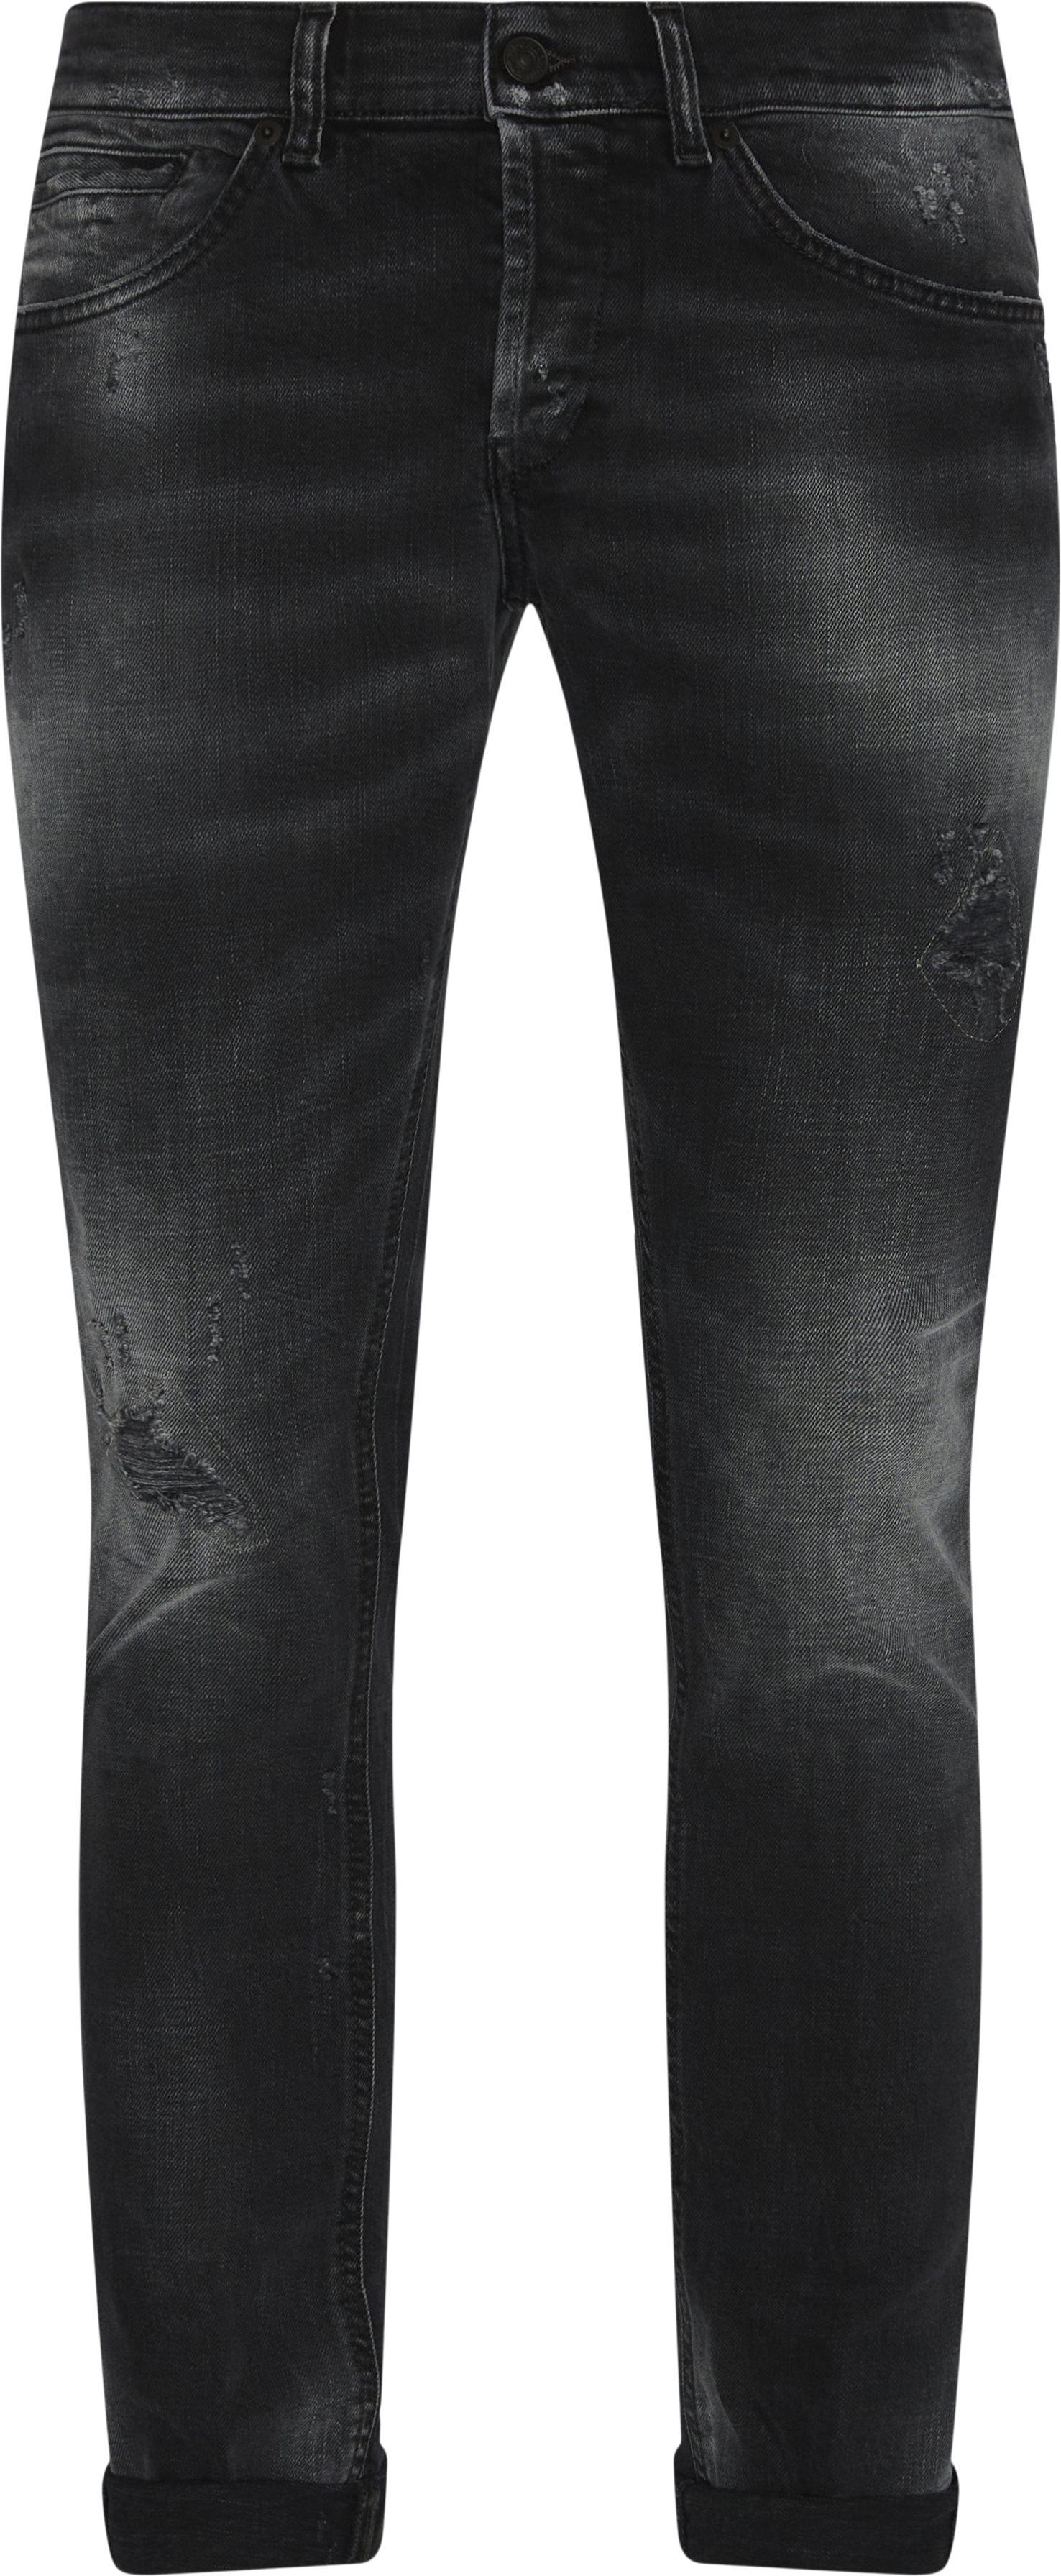 George Jeans - Jeans - Skinny fit - Sort